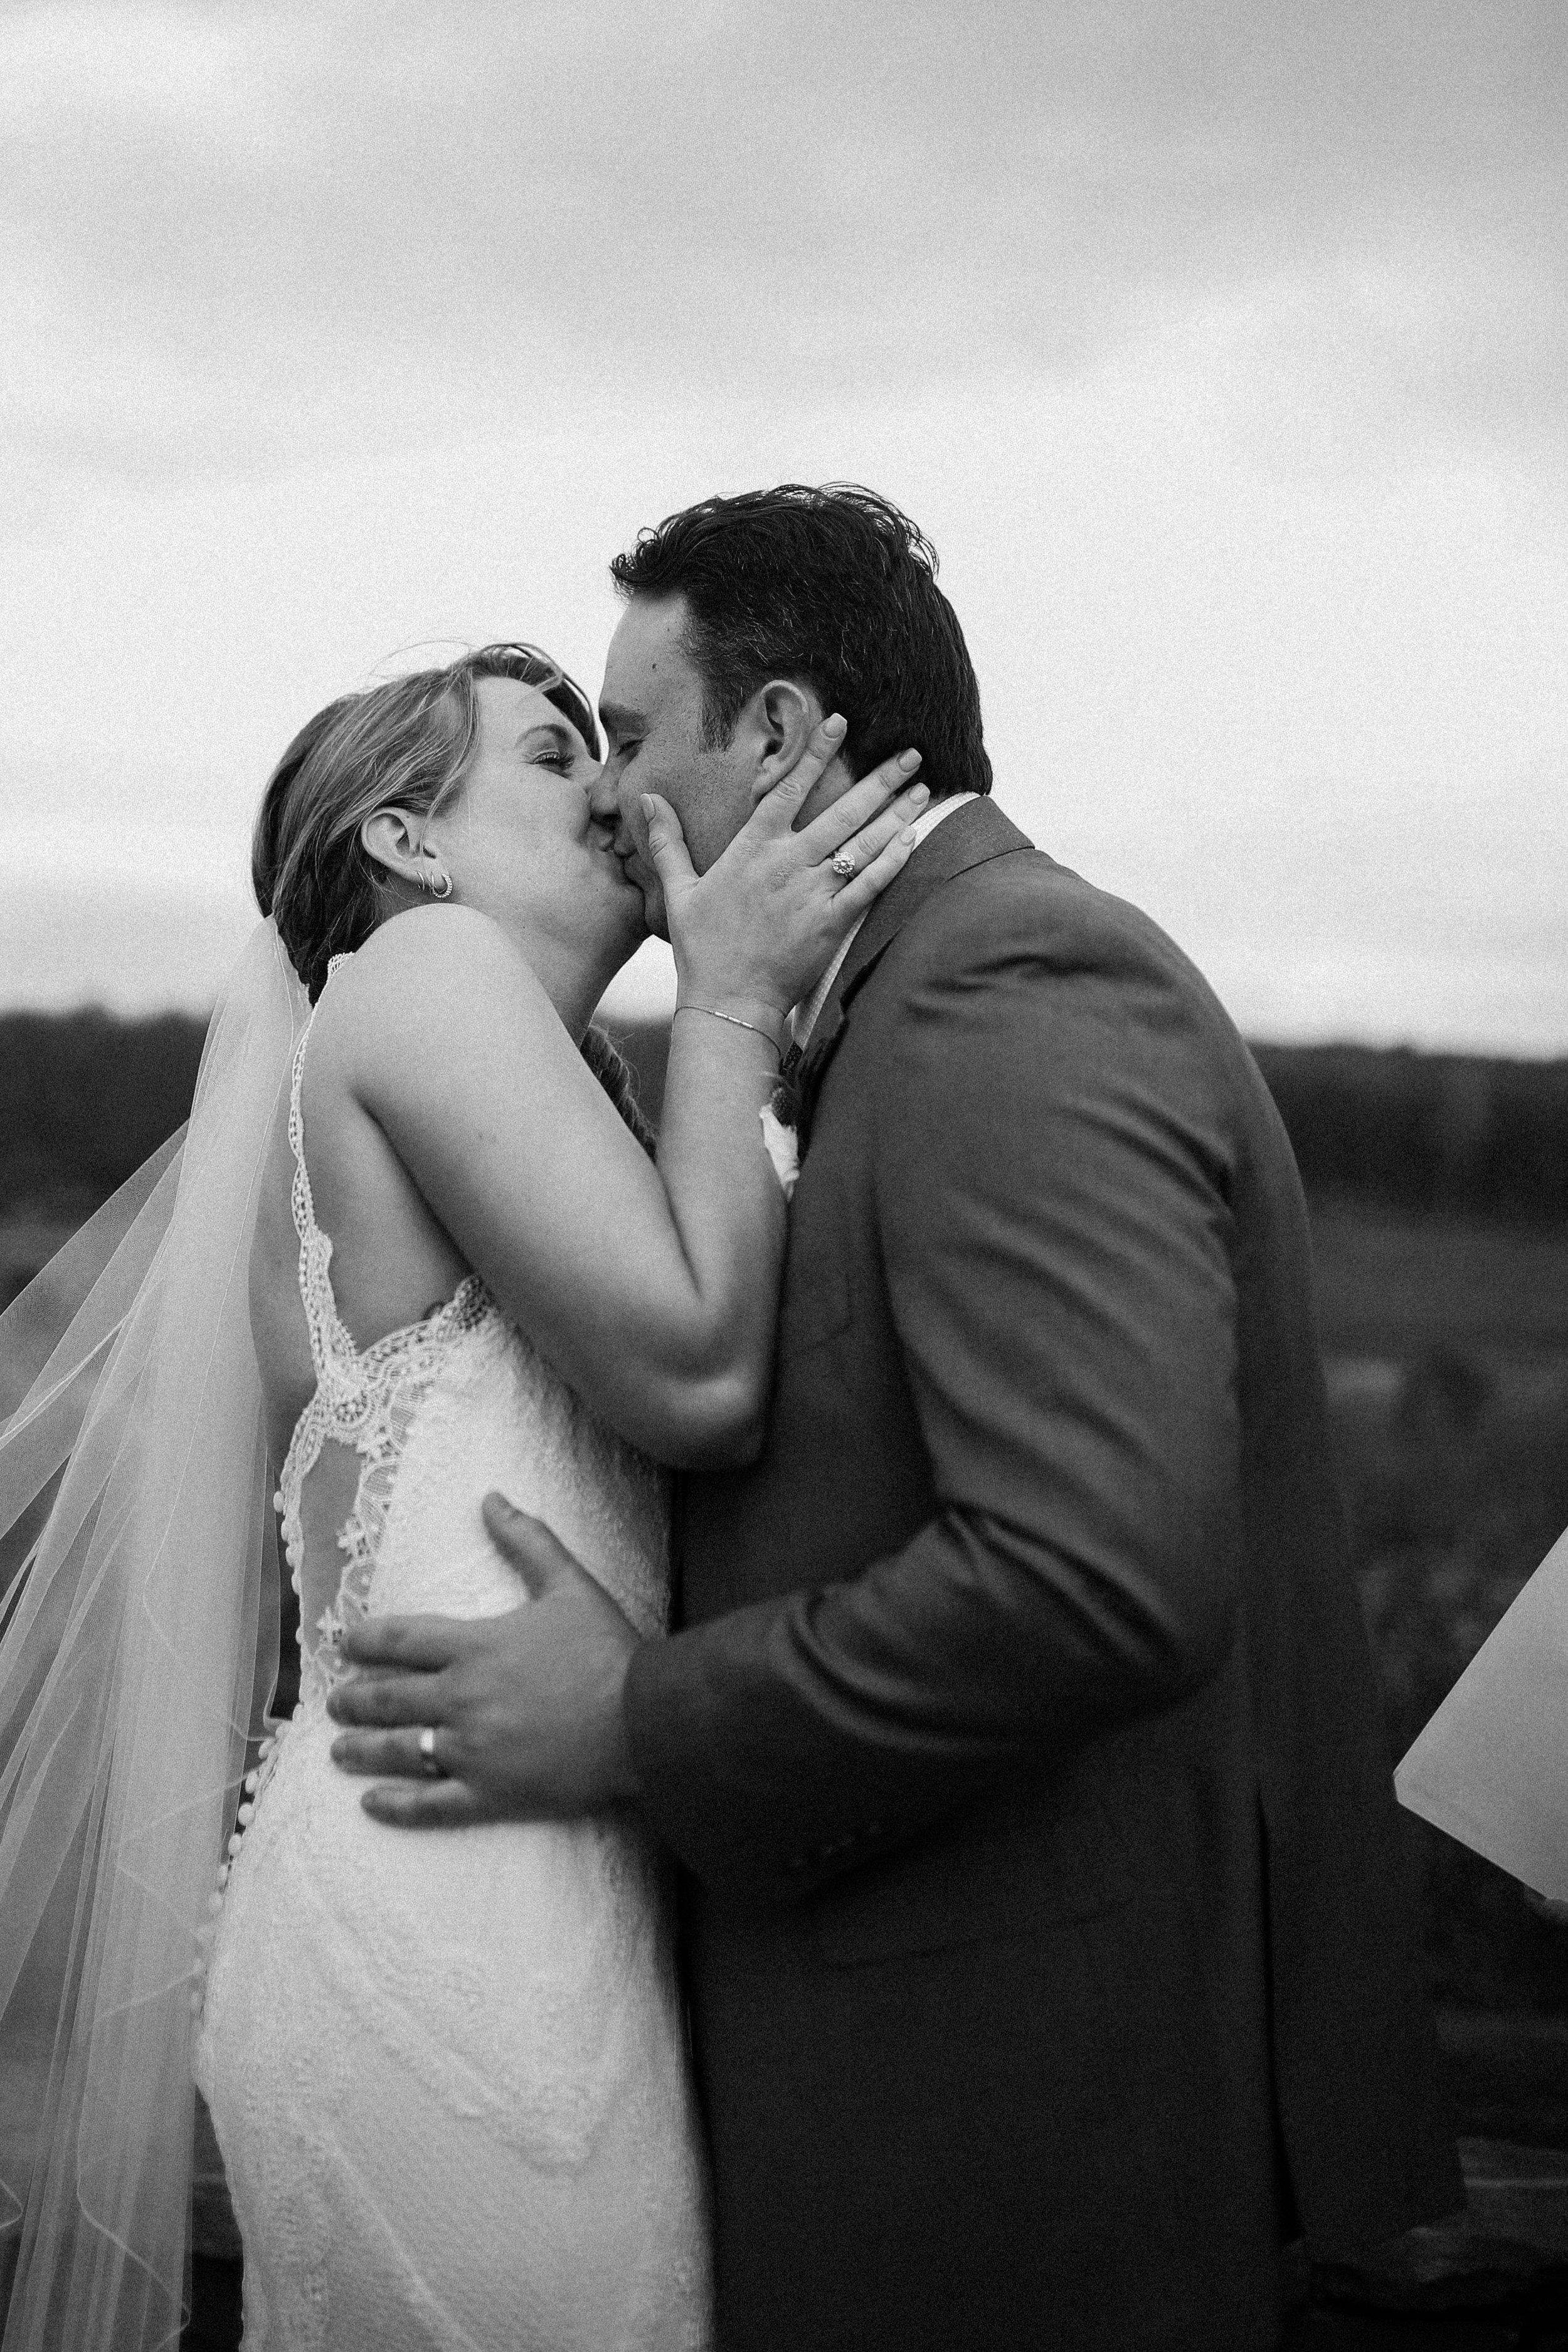 TheGreens_Married_2019-342.jpg